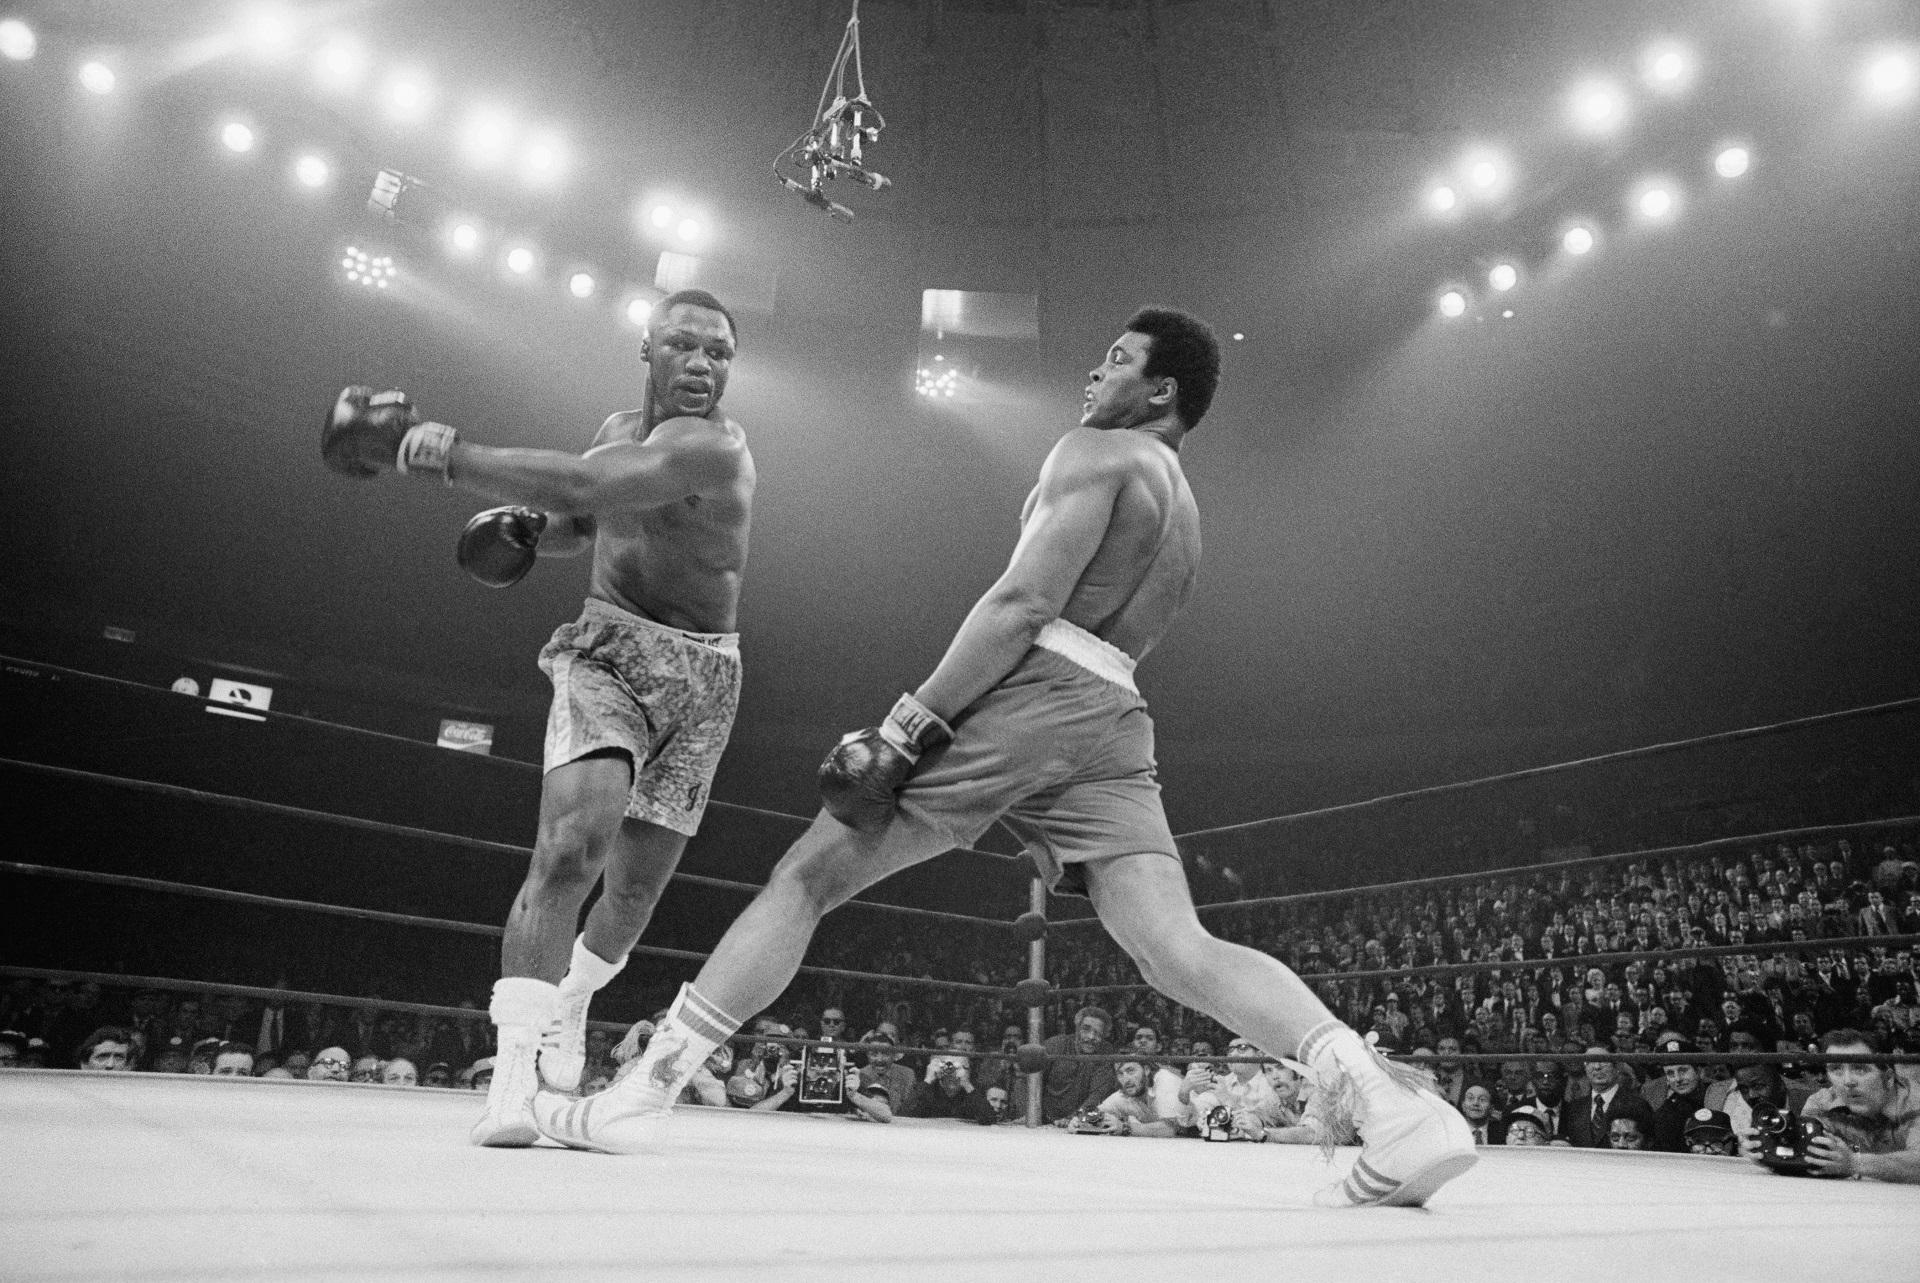 People 1920x1283 Muhammad Ali sport  sports boxing Joe Frazier legend monochrome crowds history